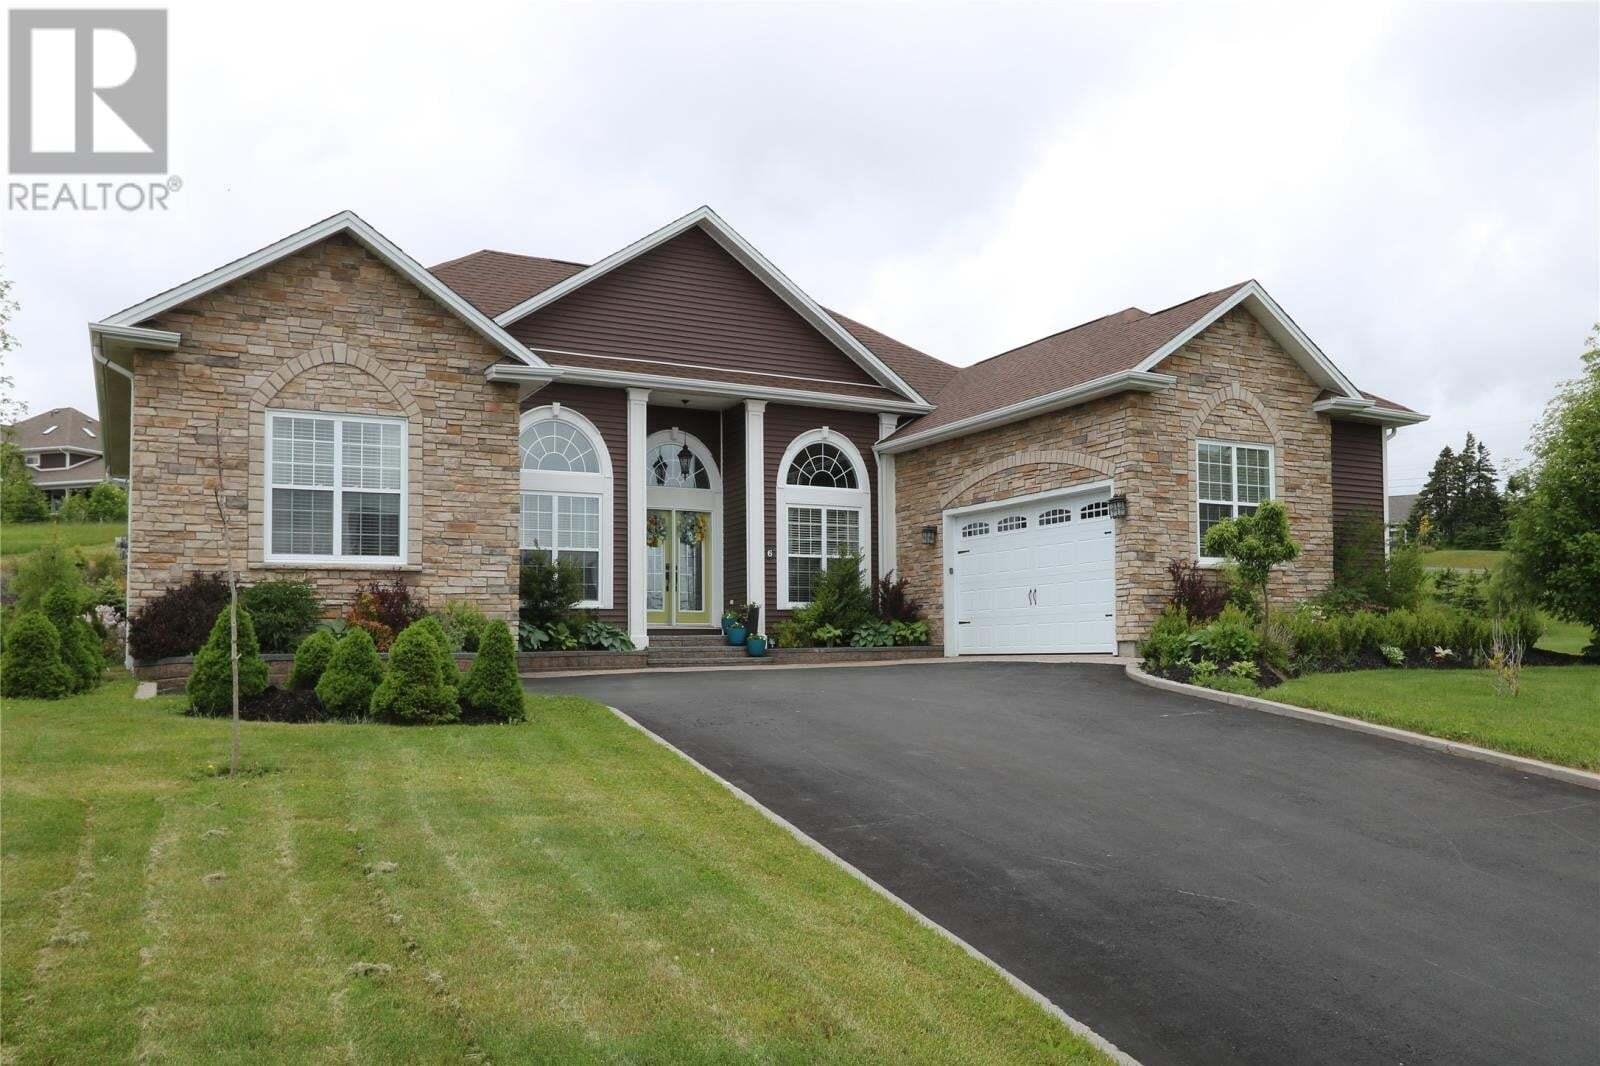 House for sale at 6 Ashkay Dr Logy Bay Newfoundland - MLS: 1213319